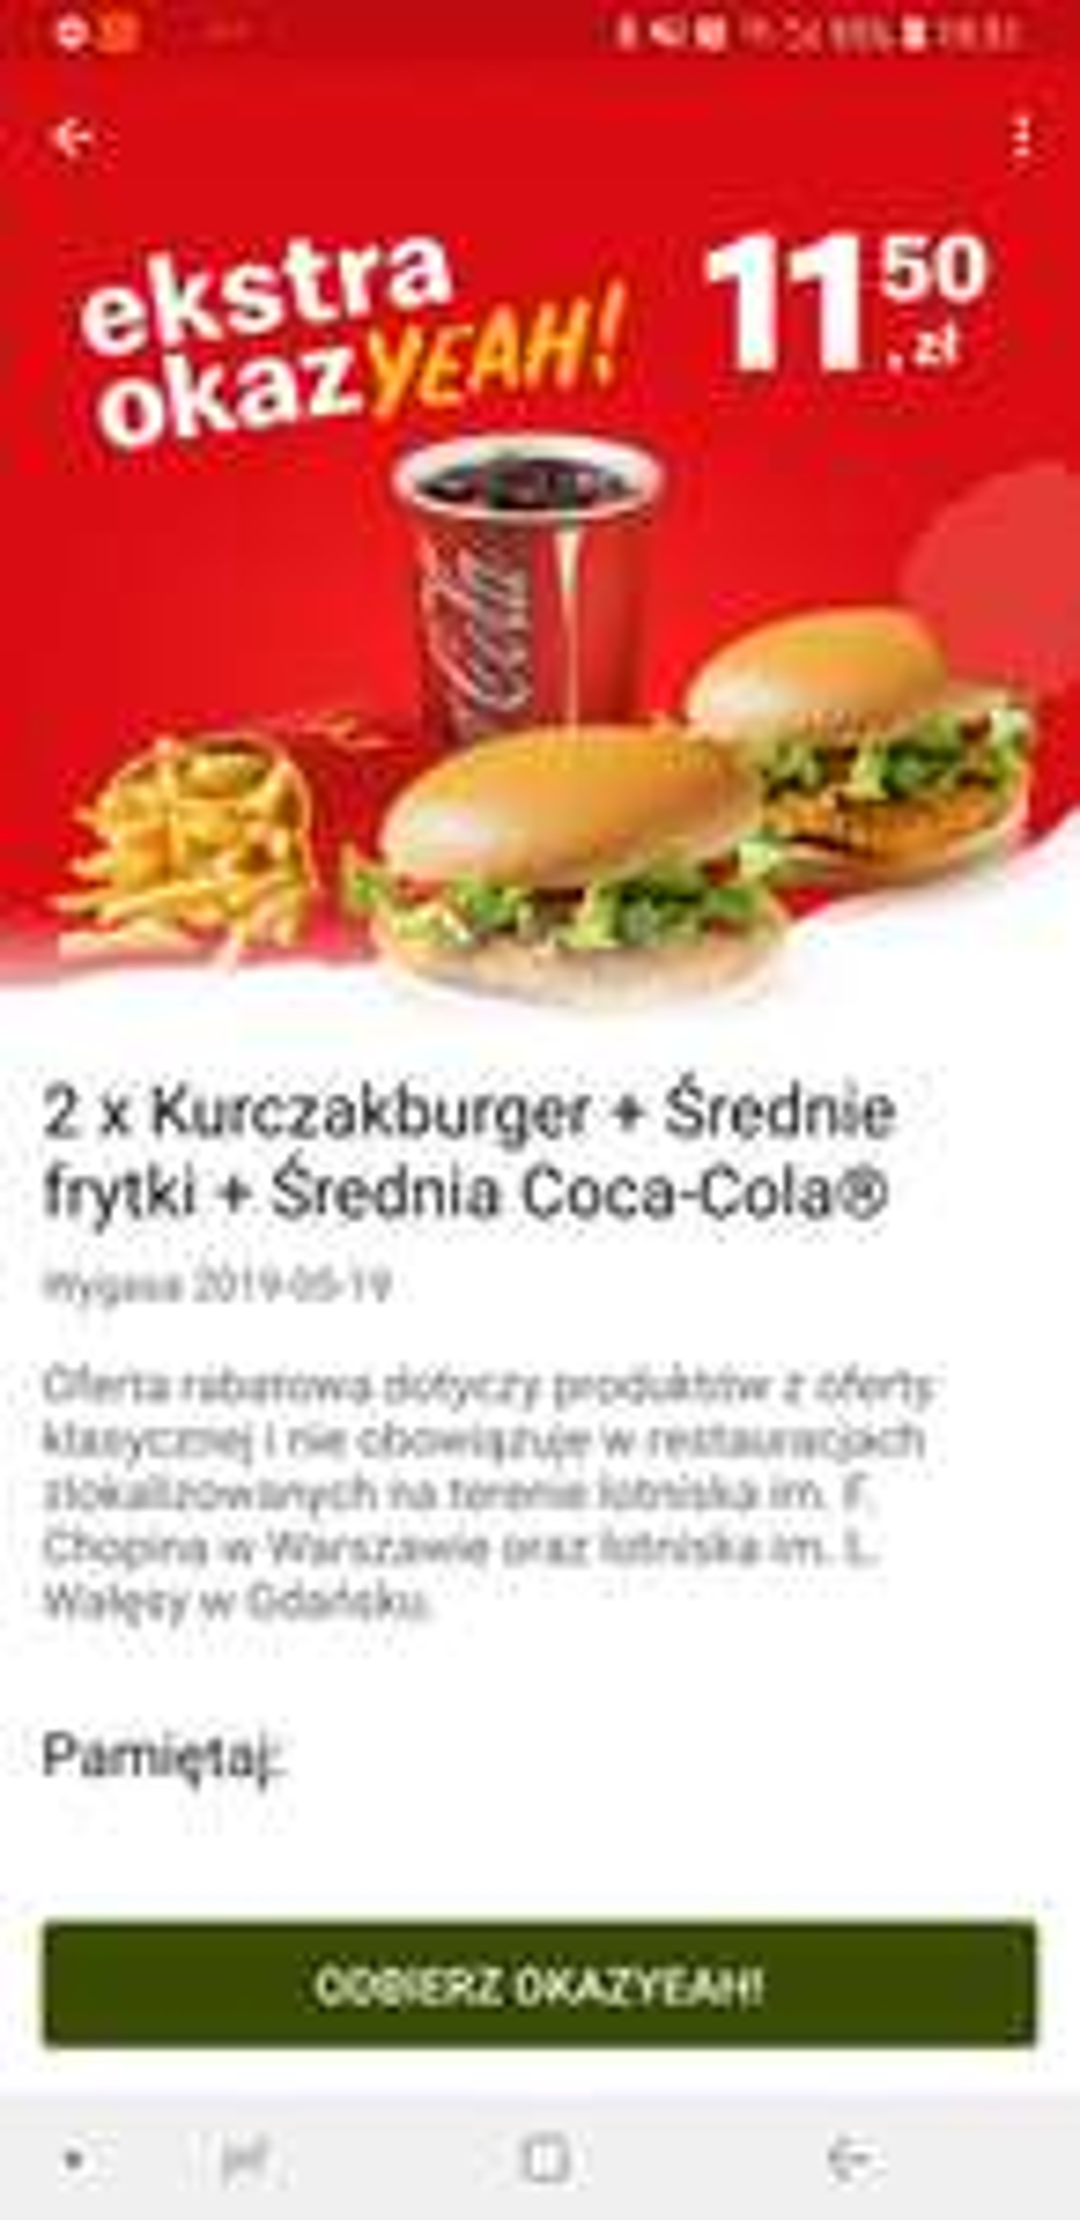 McDonald 2xkurczakburger, średnie frytki, średnia cola